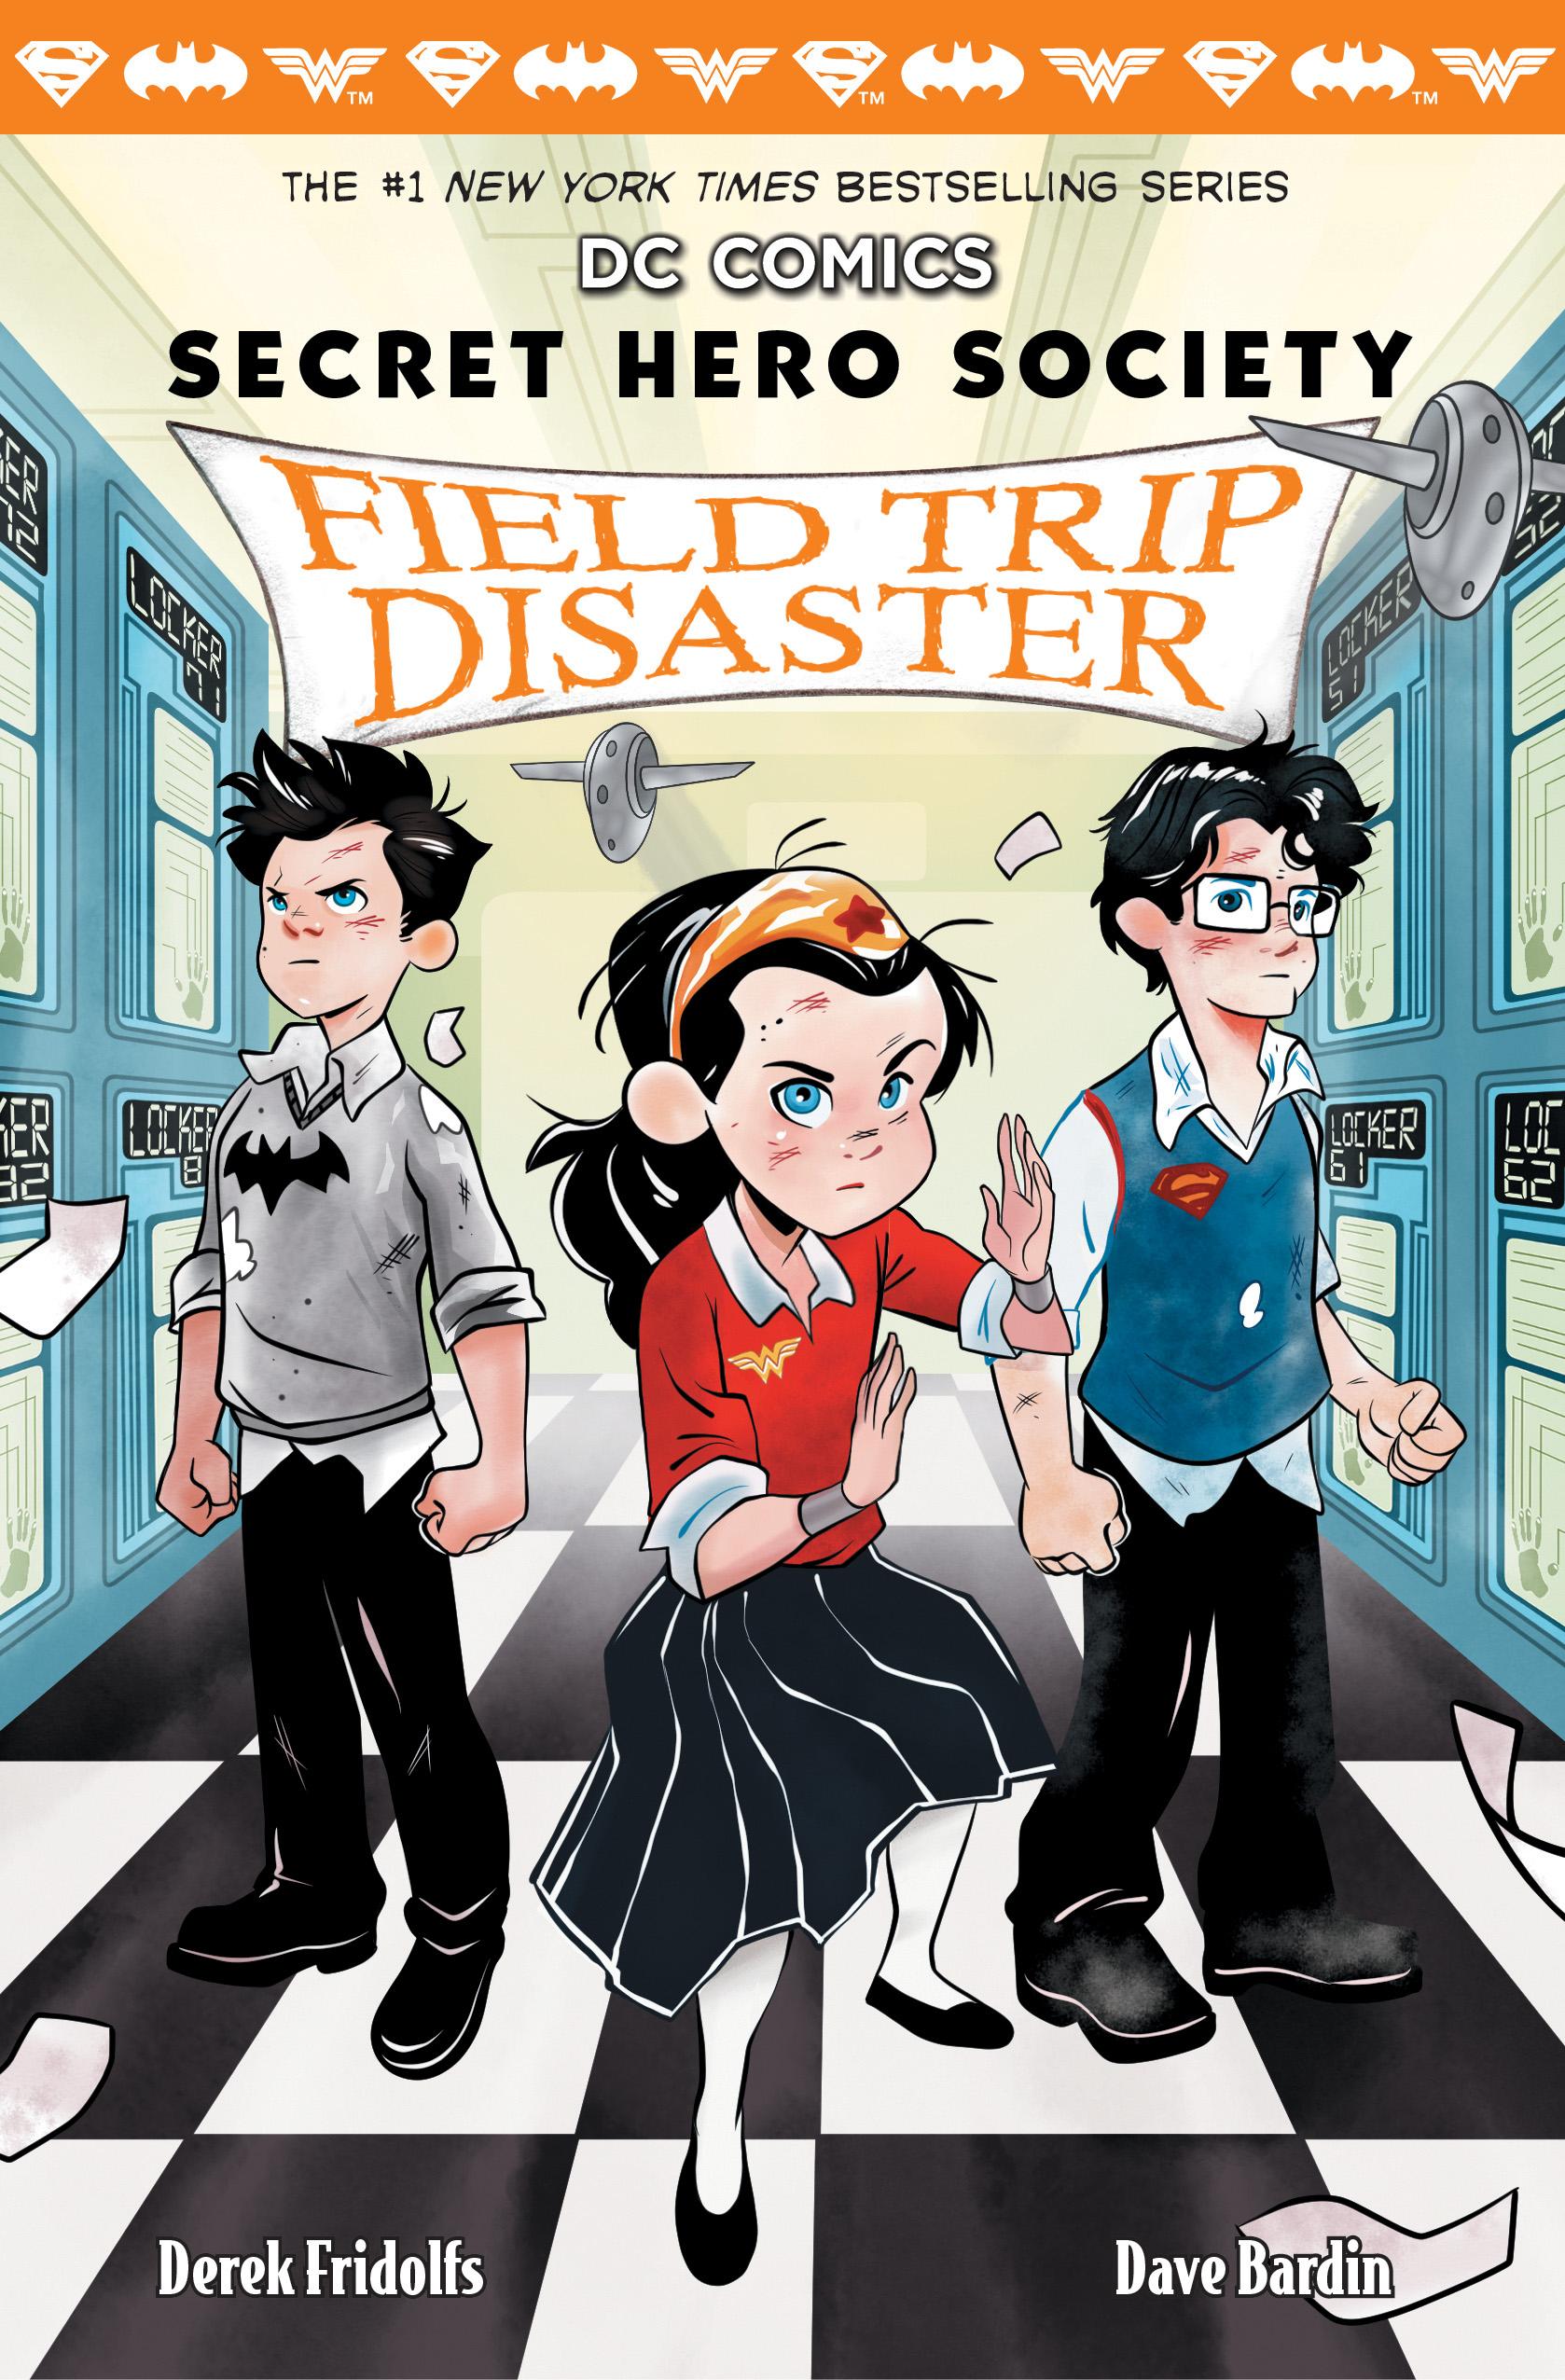 Field Trip Disaster (Secret Hero Society, #5) by Derek Fridolfs